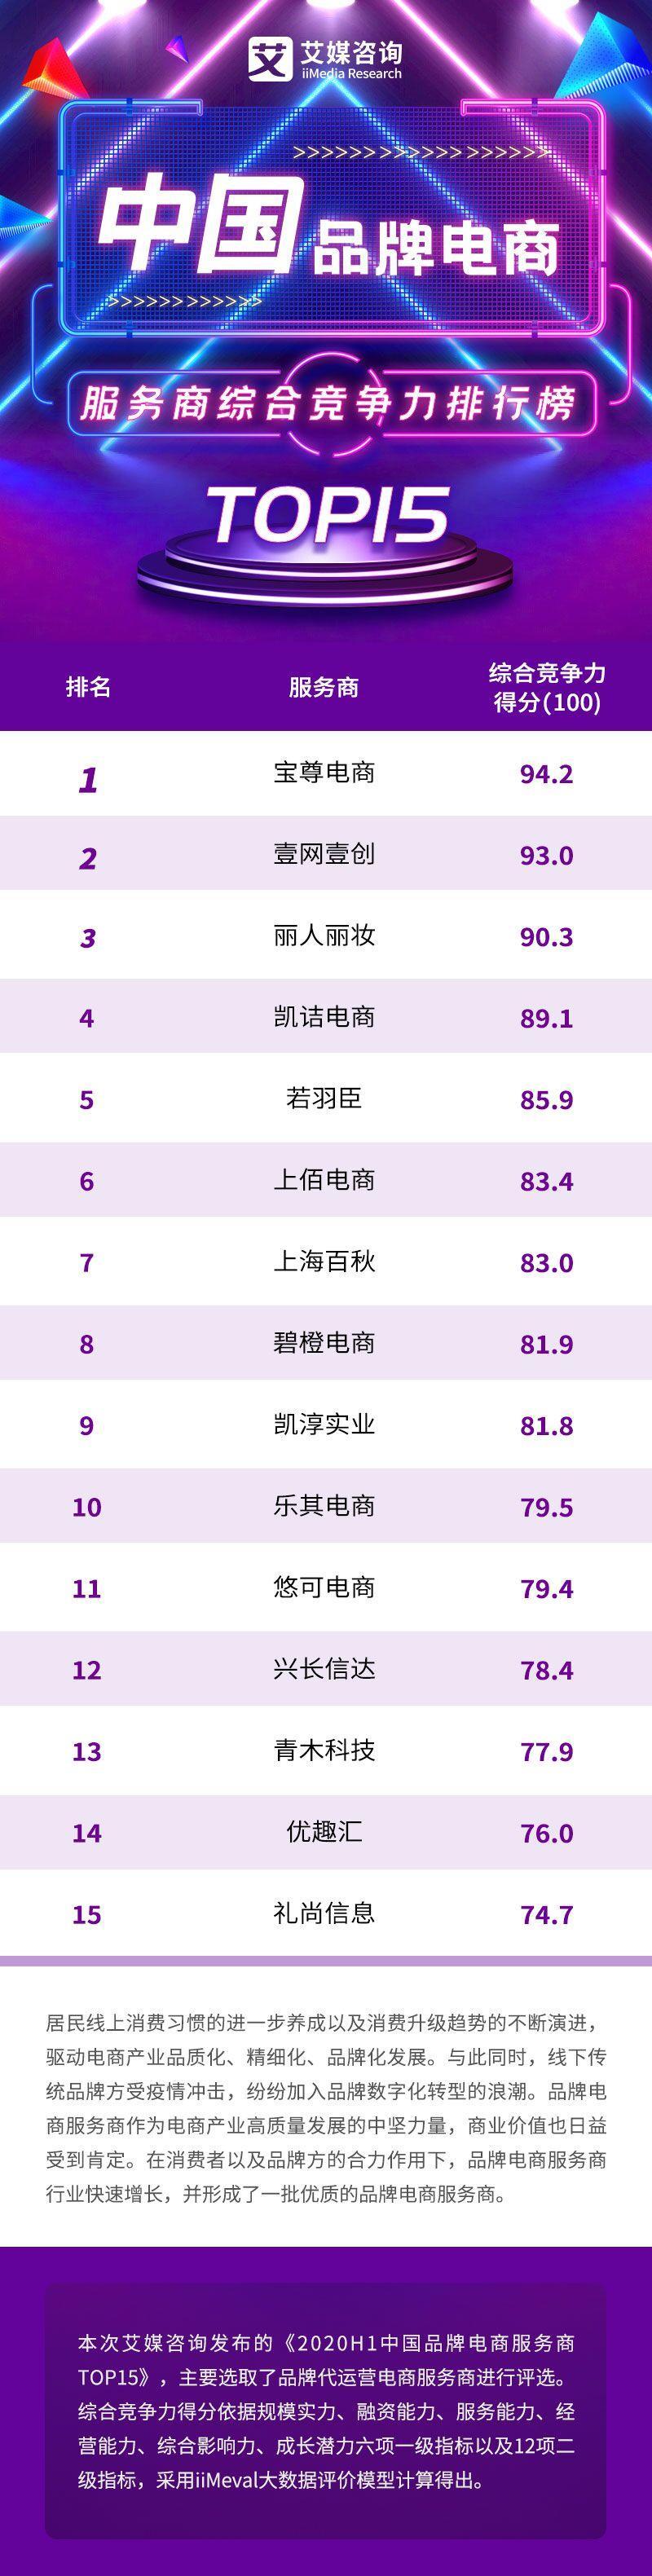 2020H1中国品牌电商服务商综合竞争力排行榜